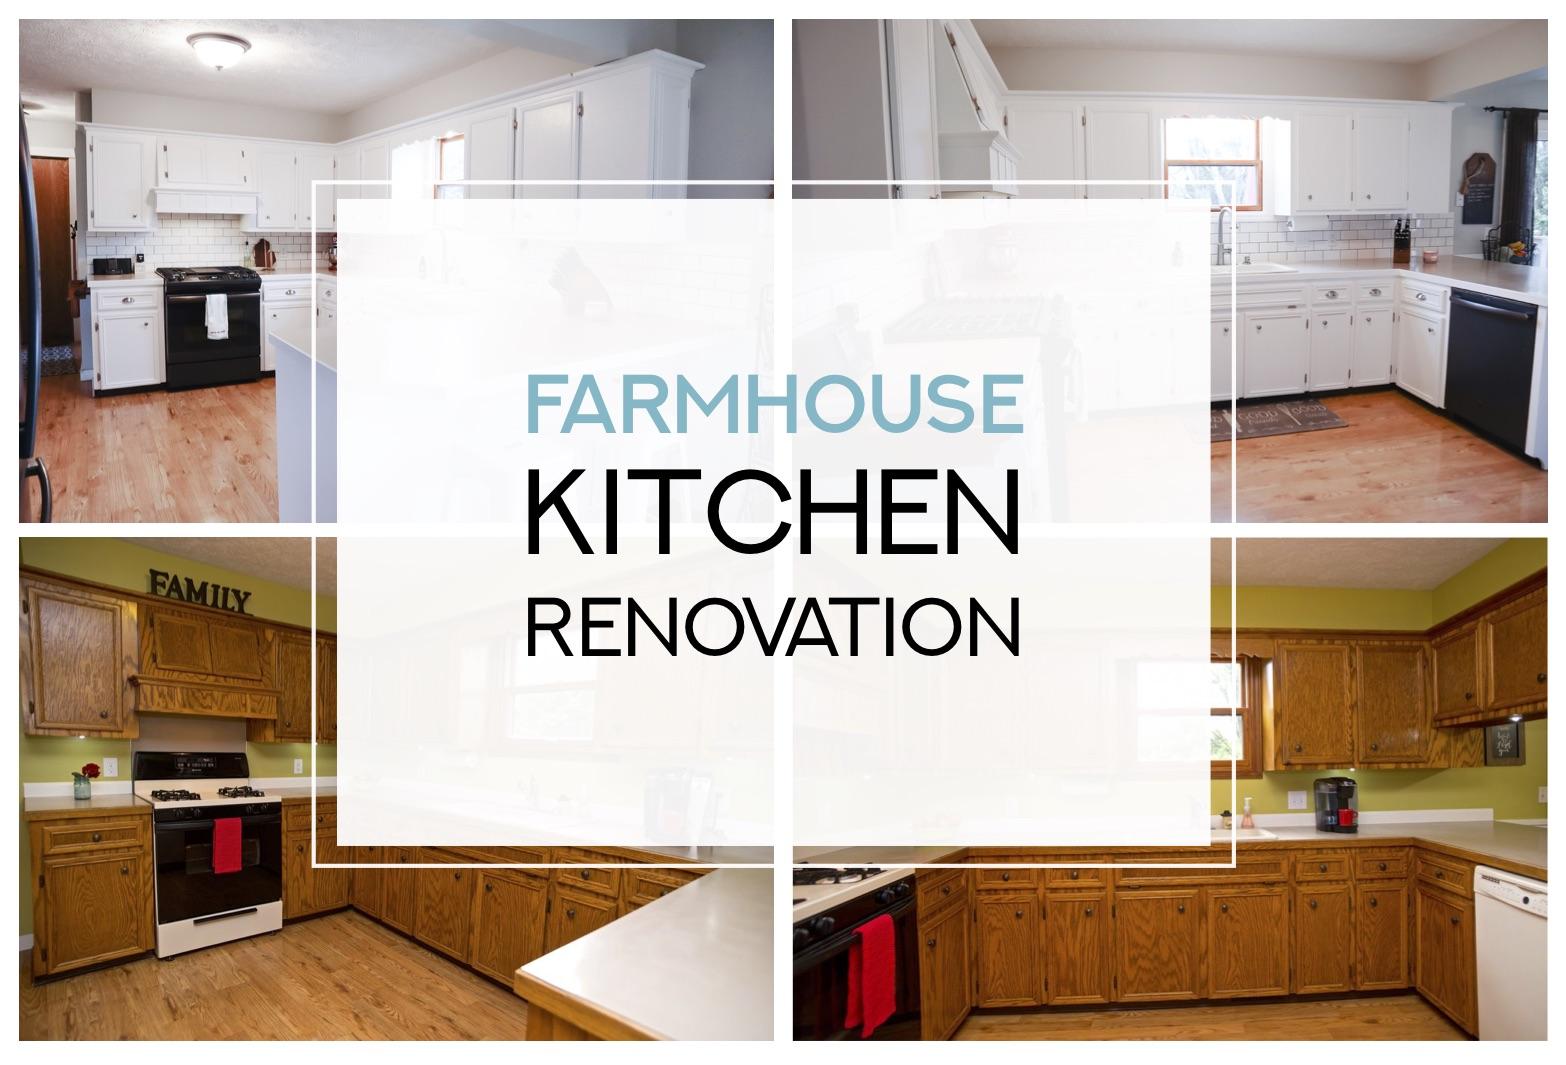 Farmhouse Kitchen Renovation: Before & After – Basil Belle